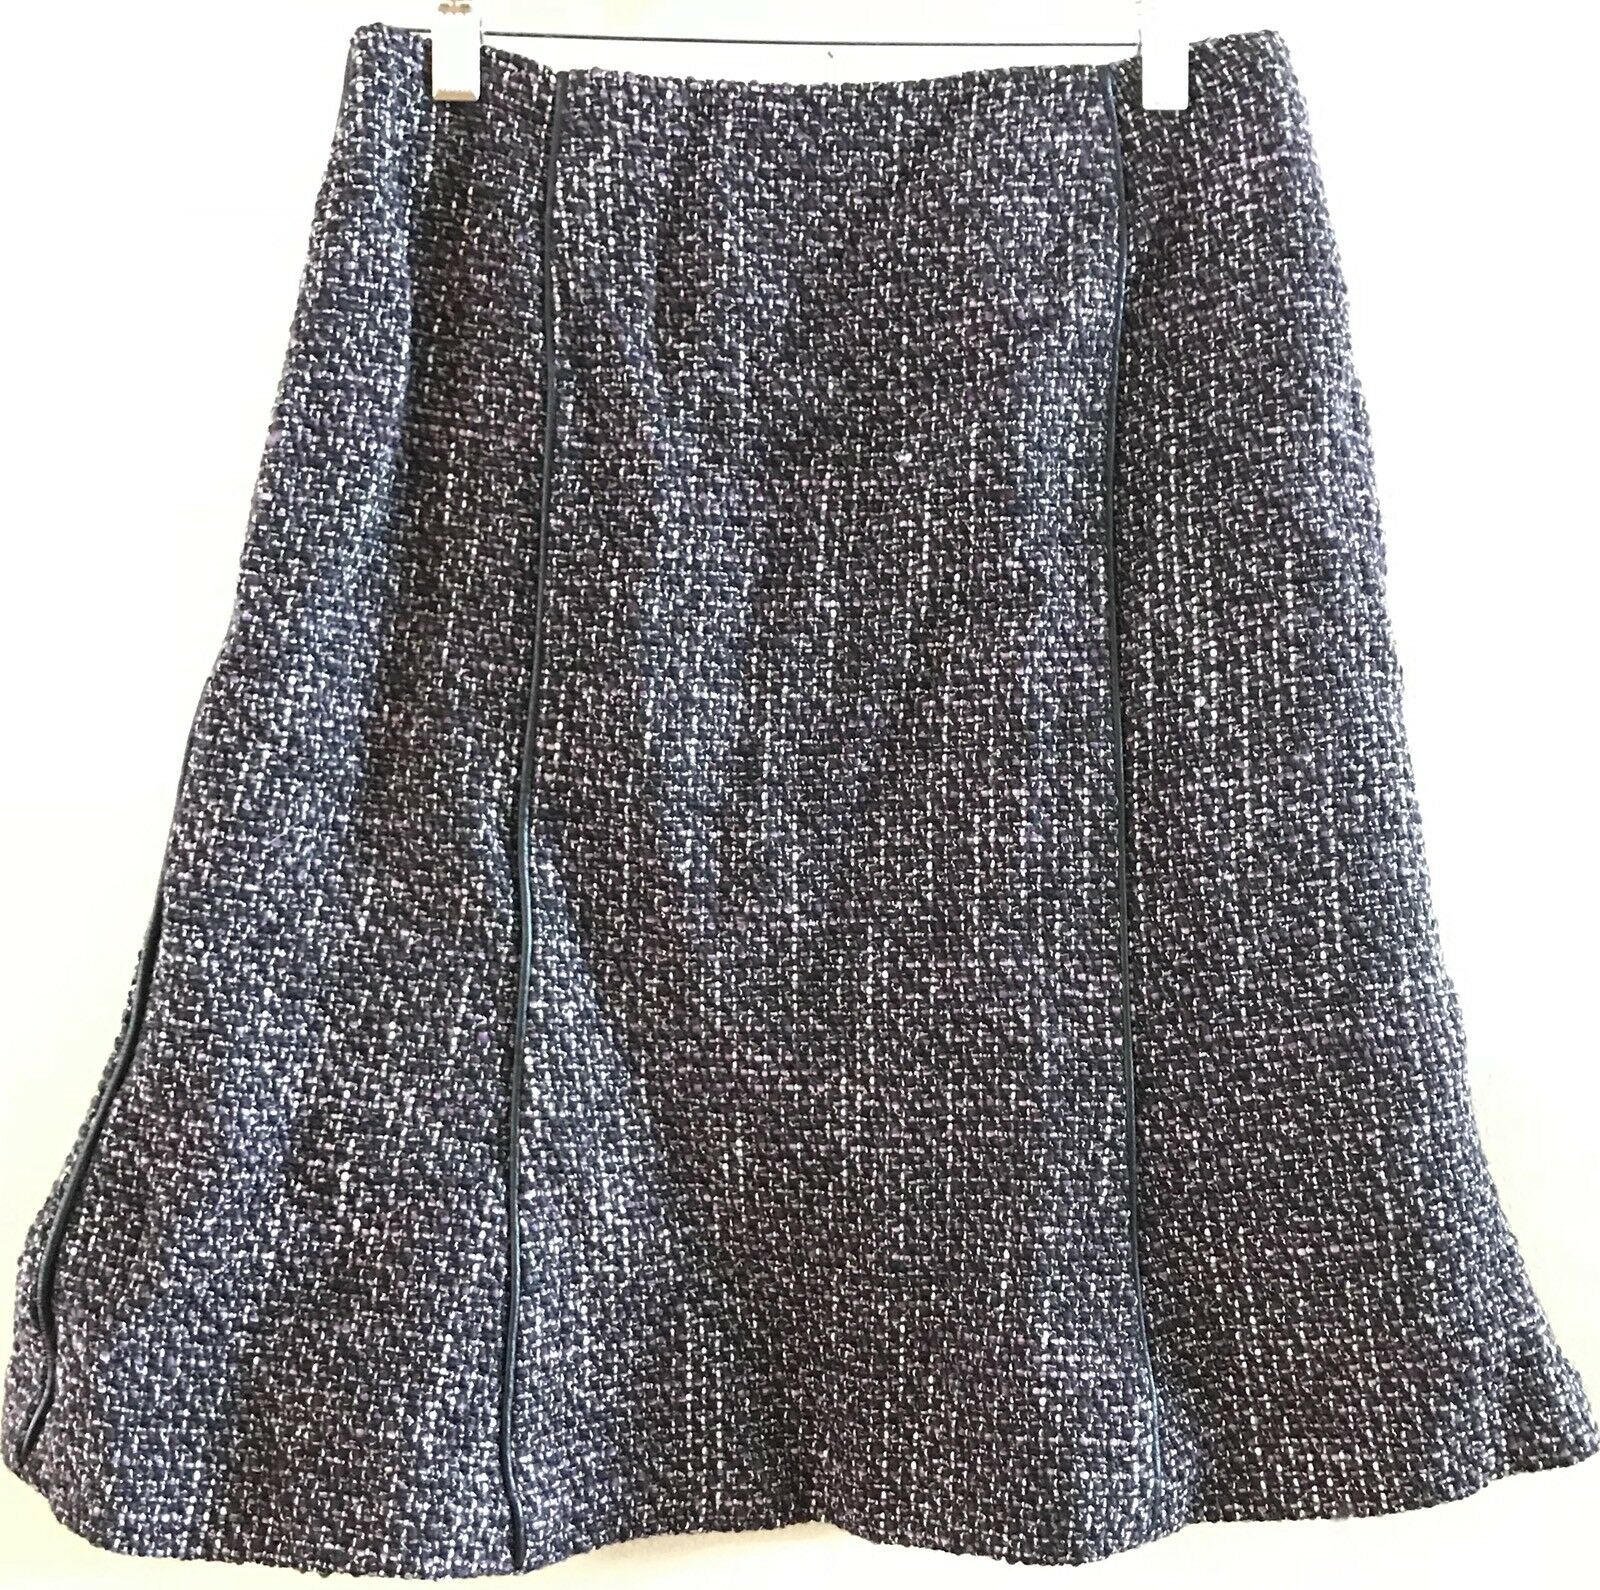 DANA BUCHMAN Wool Blend Leather Trim Skirt Size 8 Pet Gently Worn Exc Condition